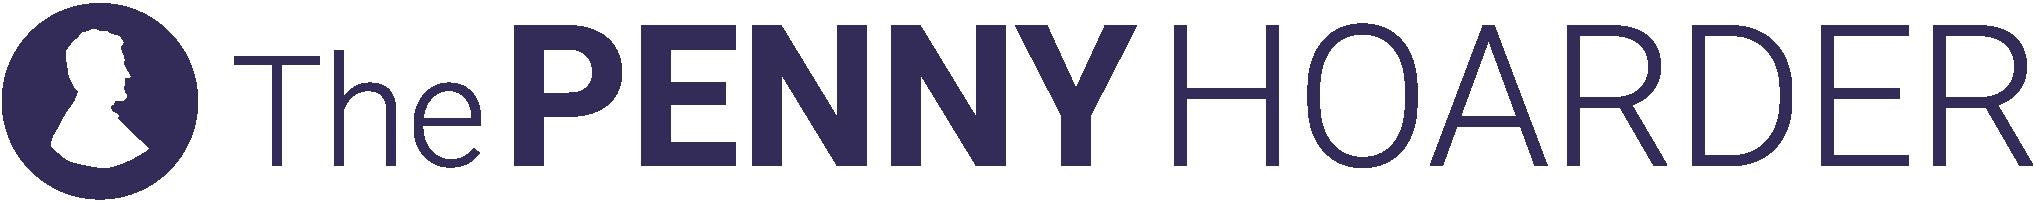 TPH_Logo_Horizontal_v2.png